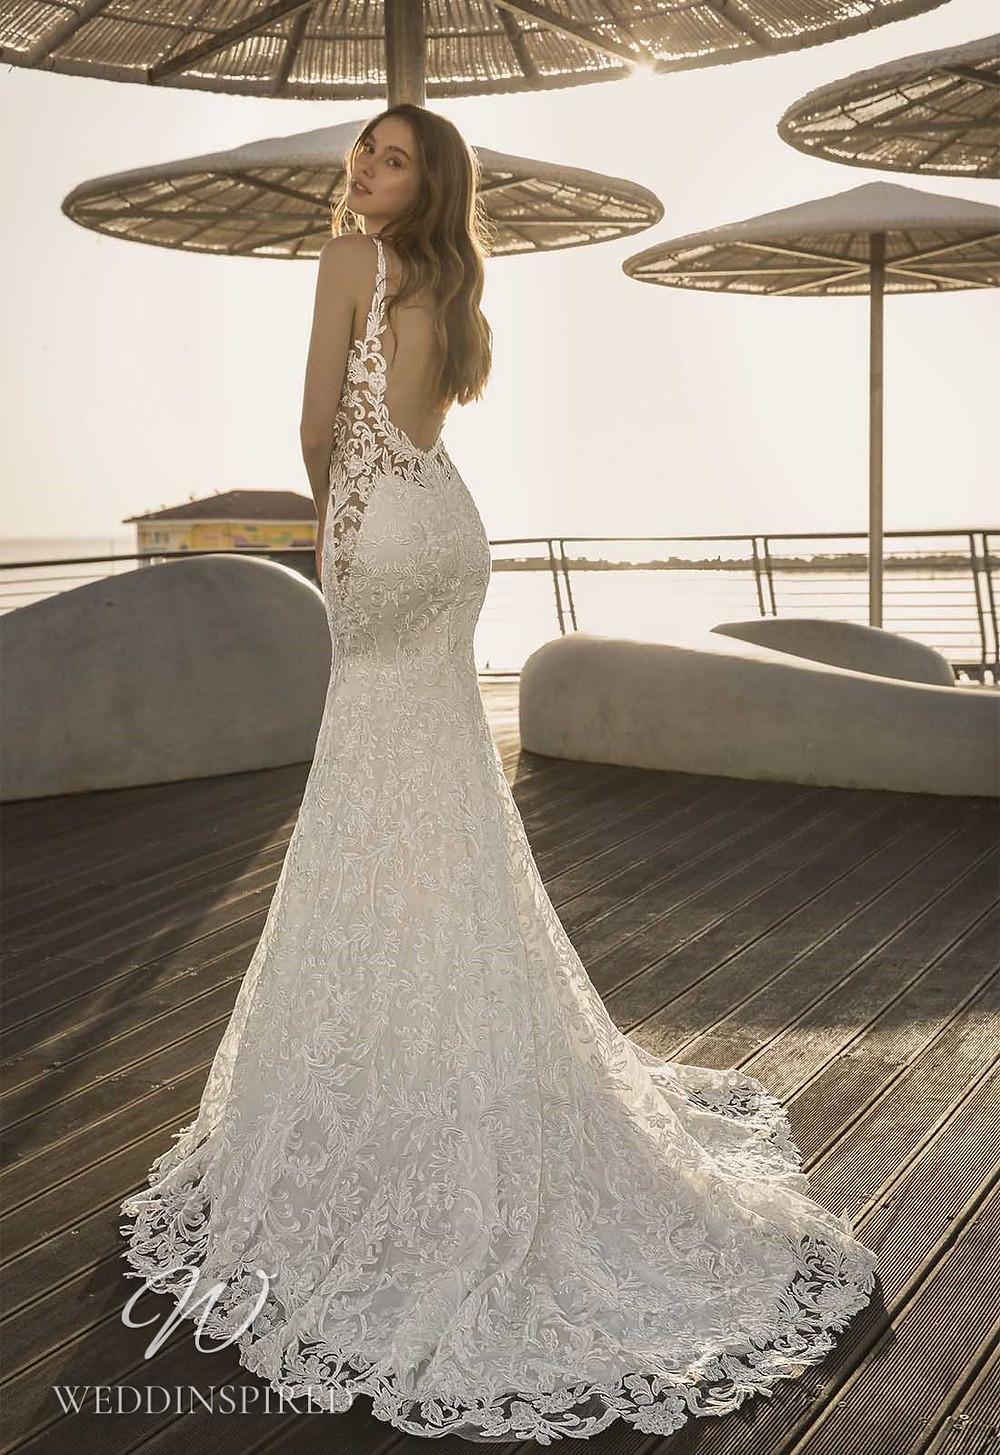 A Pnina Tornai 2021 backless lace mermaid wedding dress